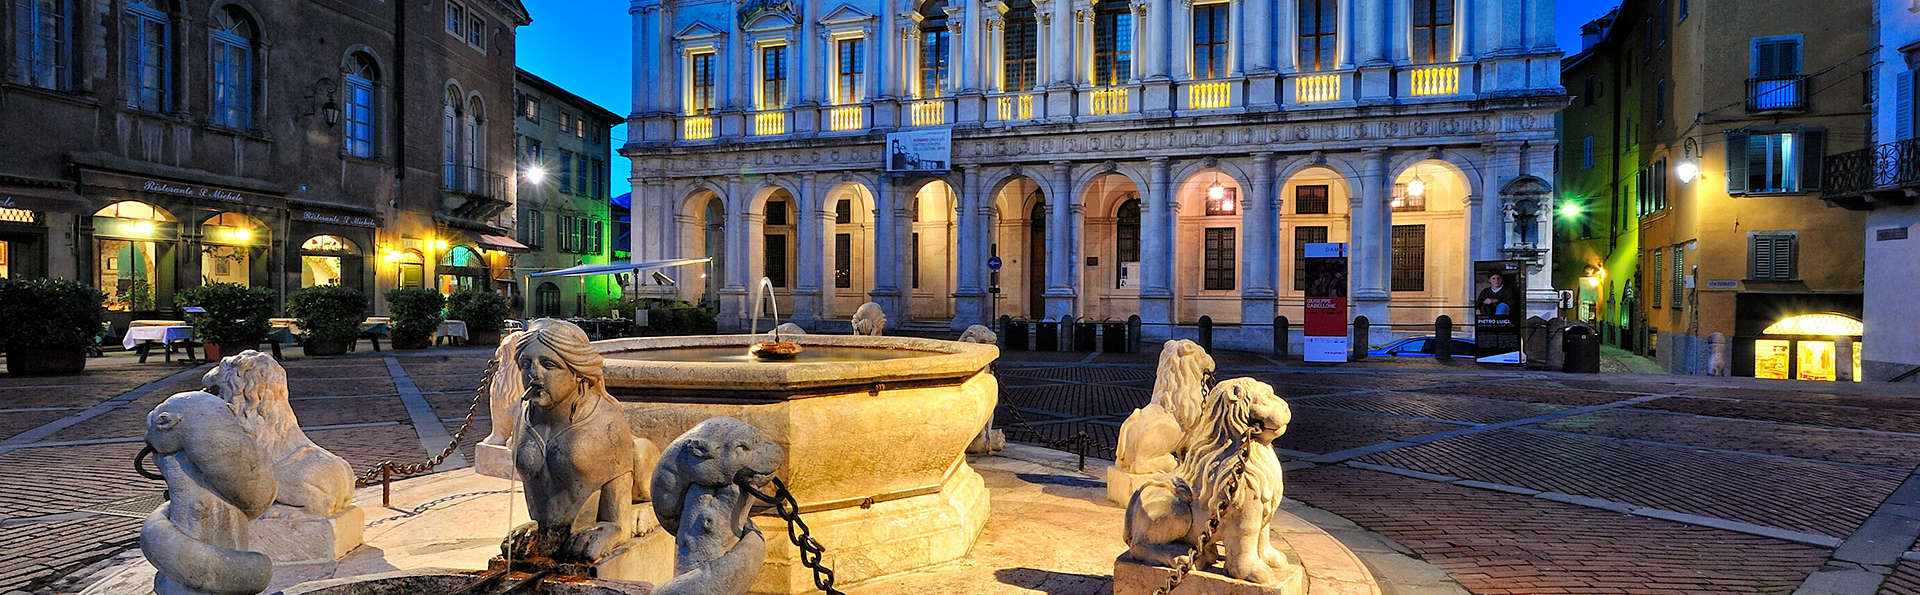 SPA Hotel Parigi 2 - EDIT_bergamo4.jpg